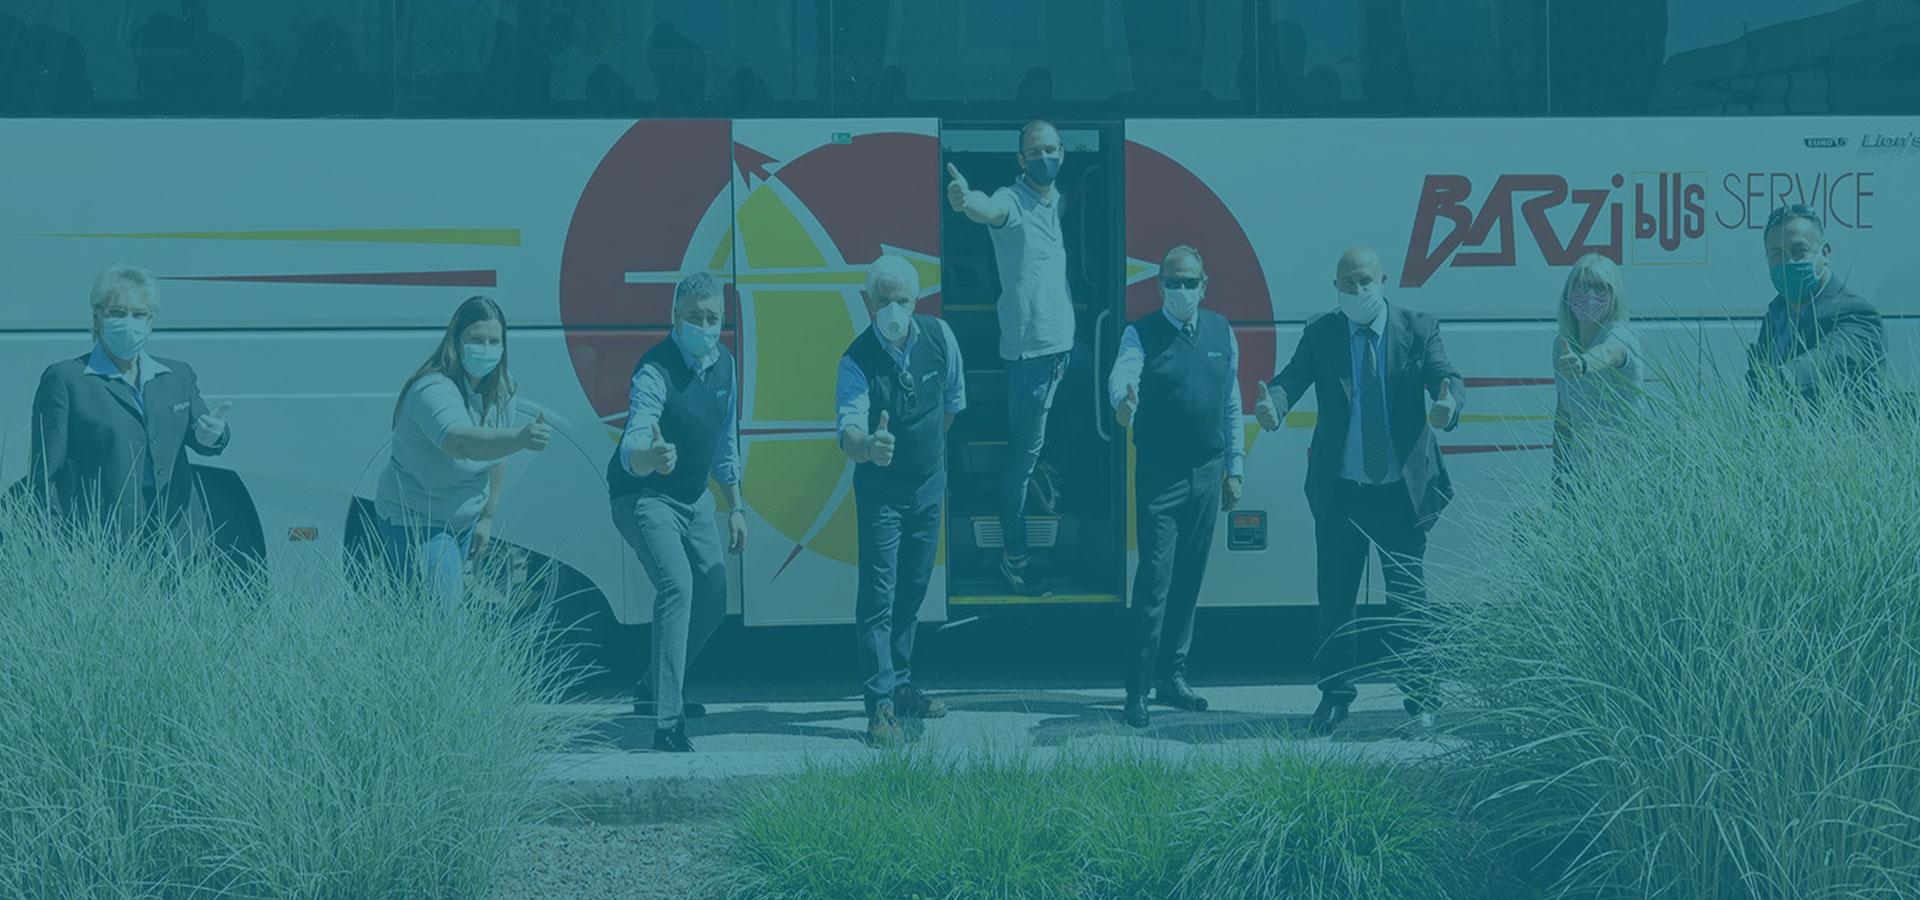 Staff Barzi COVID19 - Barzi Bus Service